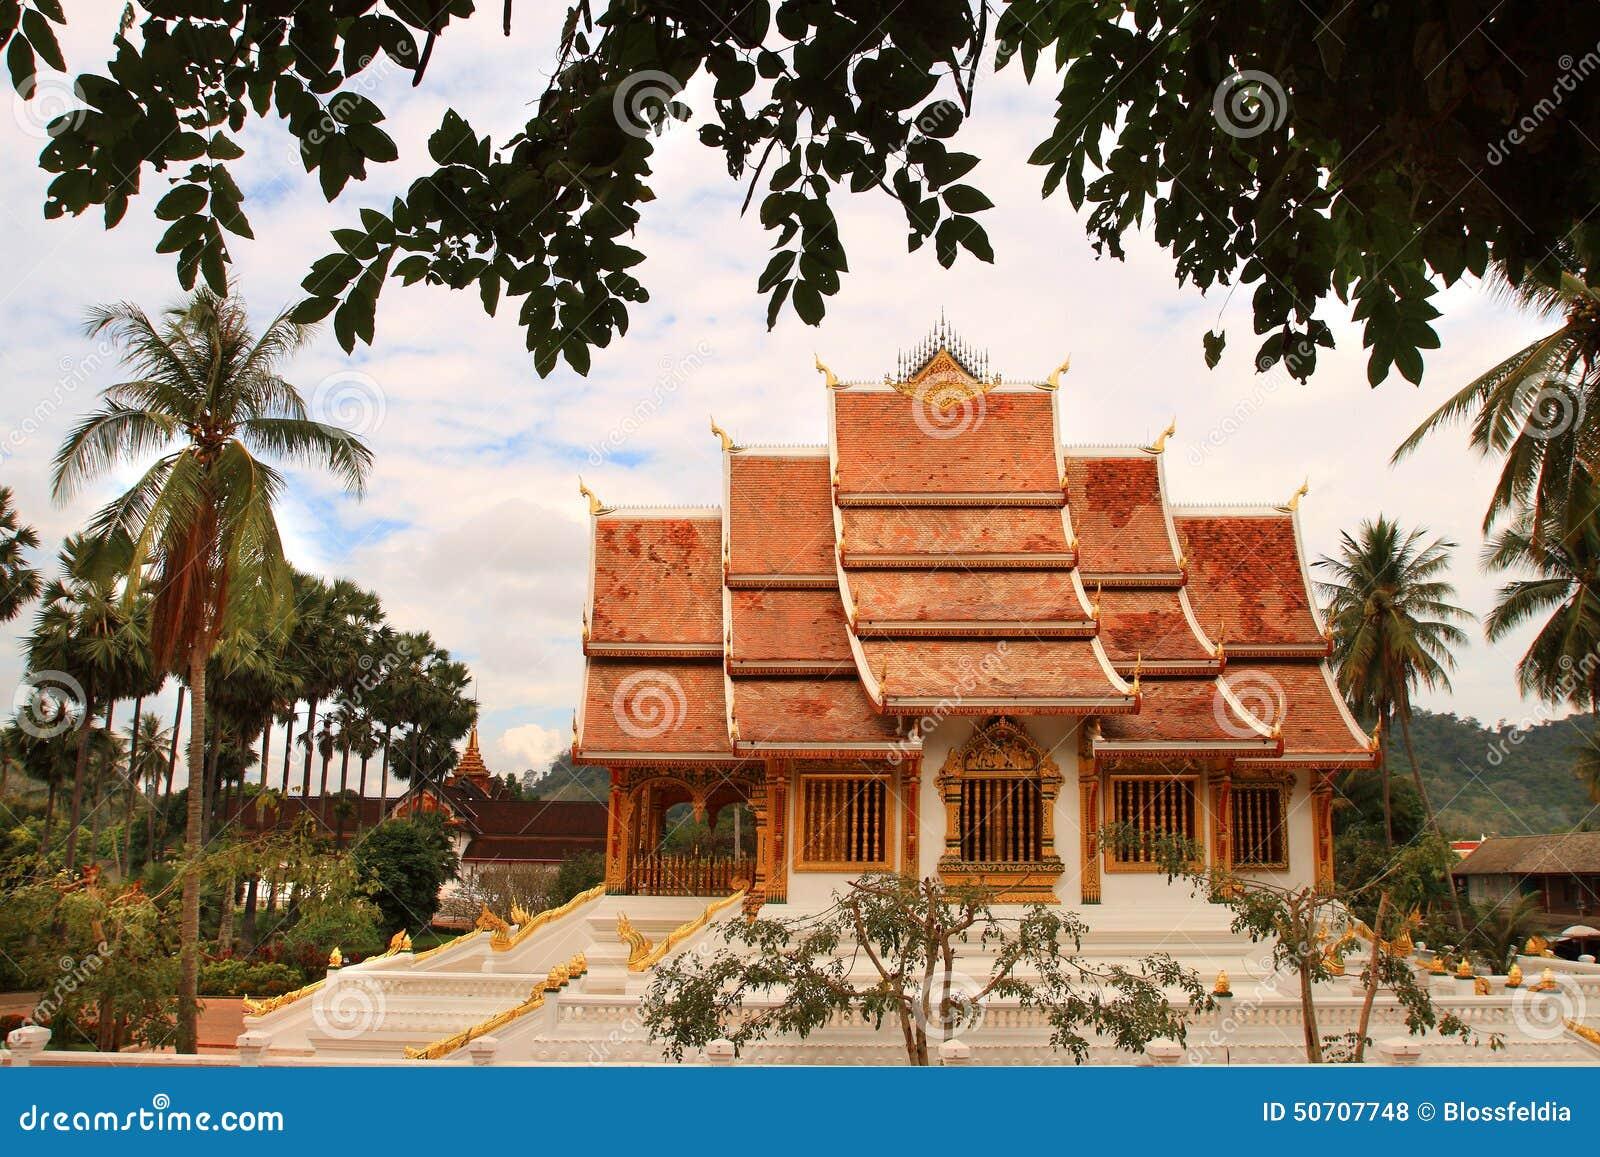 Buddistisk tempel på det hagtornKham (Royal Palace) komplexet i Luang Prabang (Laos)